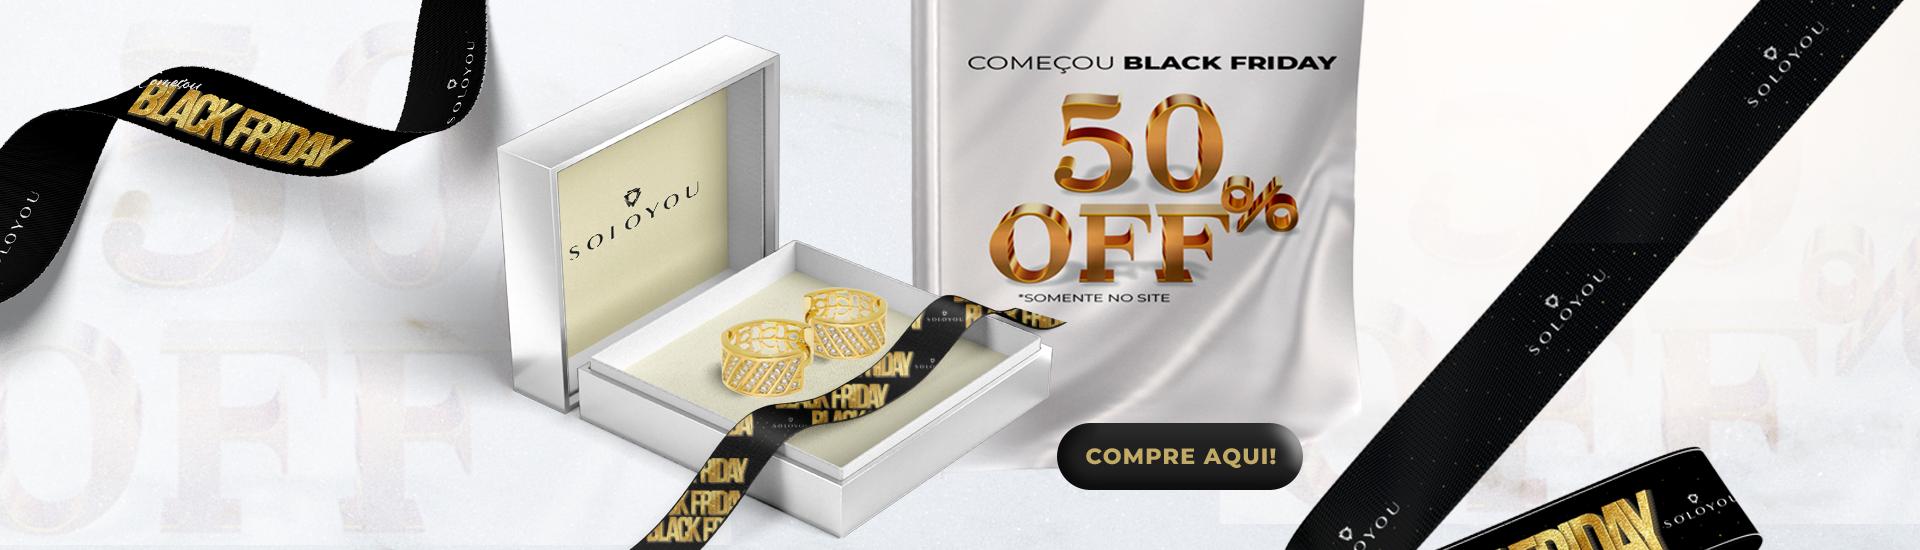 Black Friday Soloyou Semijoias com 50% OFF